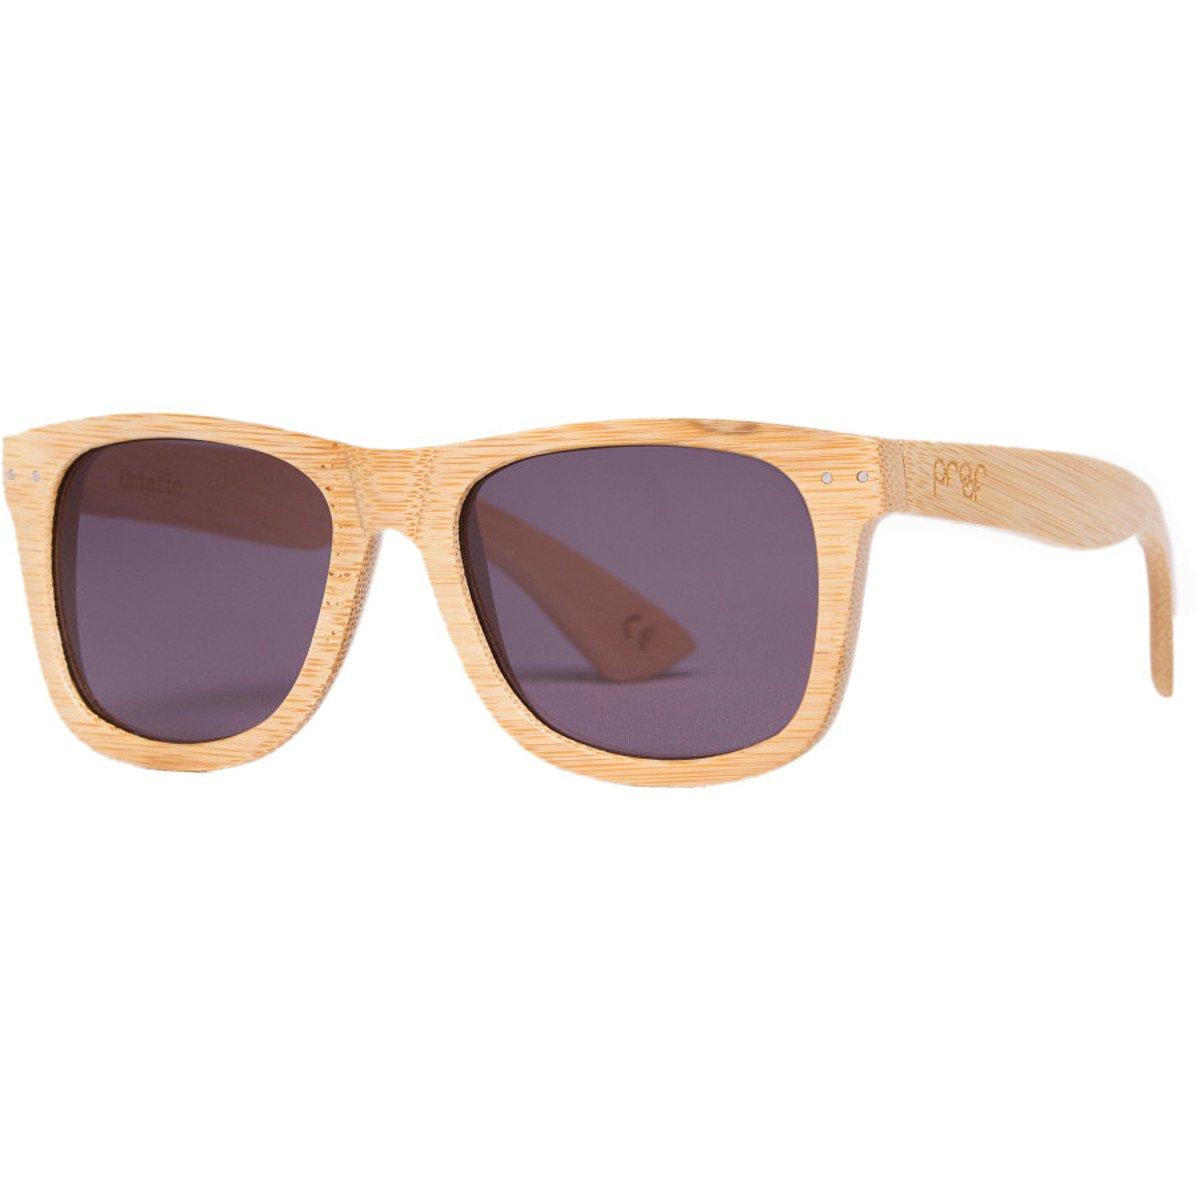 441f11ee5b Amazon.com  Proof Eyewear Ontario Wood Sunglasses Bamboo Gray Lens ...